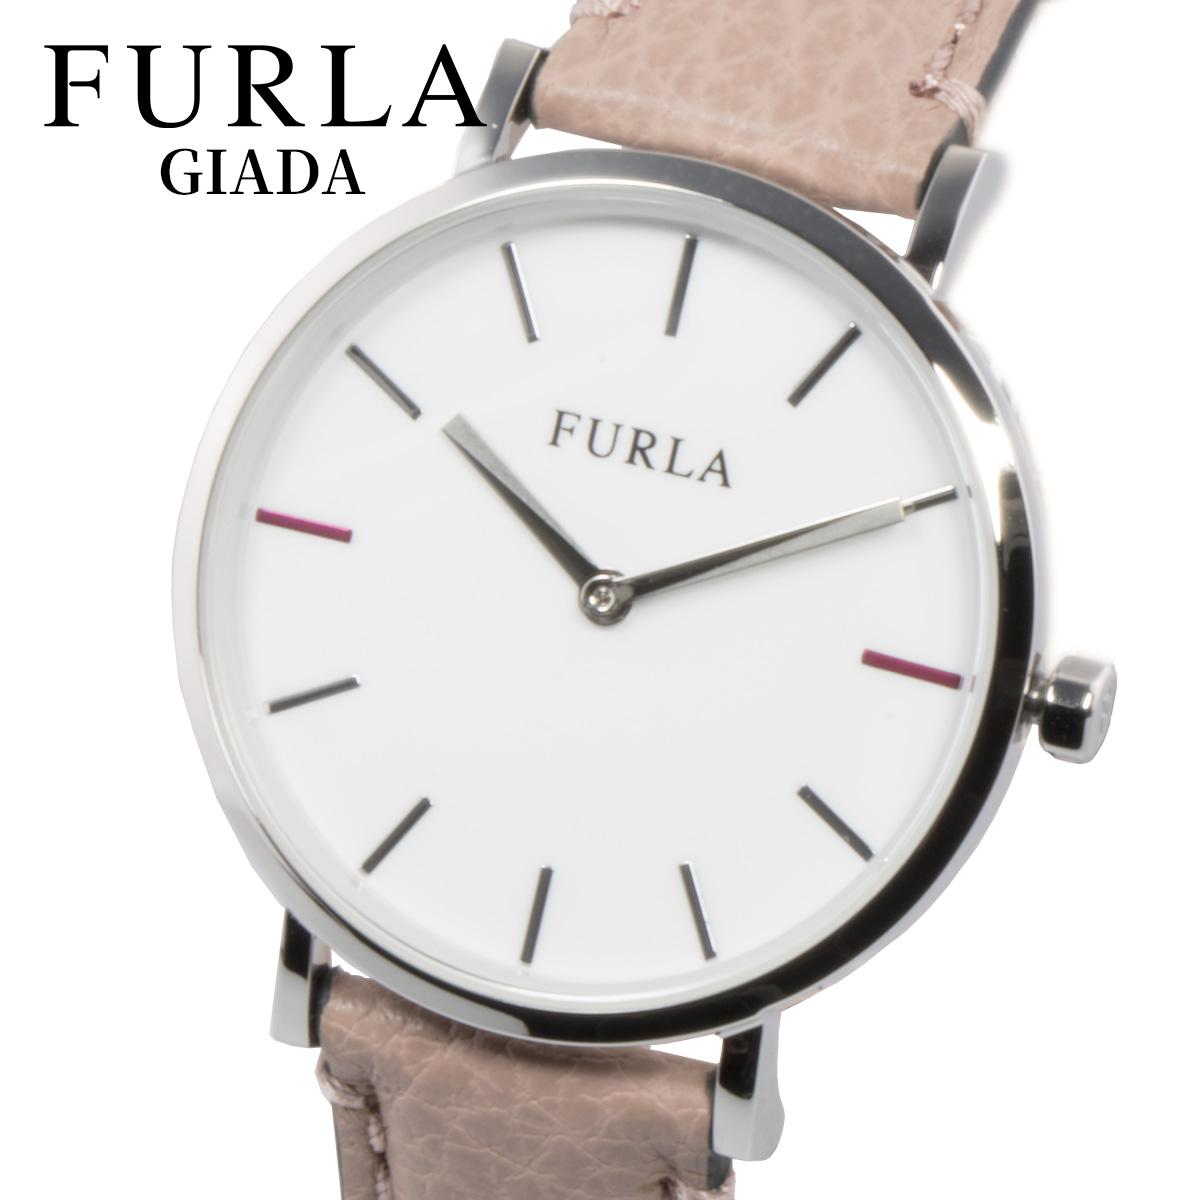 6281e9782843 フルラ 海外正規品 送料無料 あす楽フルラ FURLA ジャーダ GIADA R4251108506 レディース 時計 腕時計 クオーツ